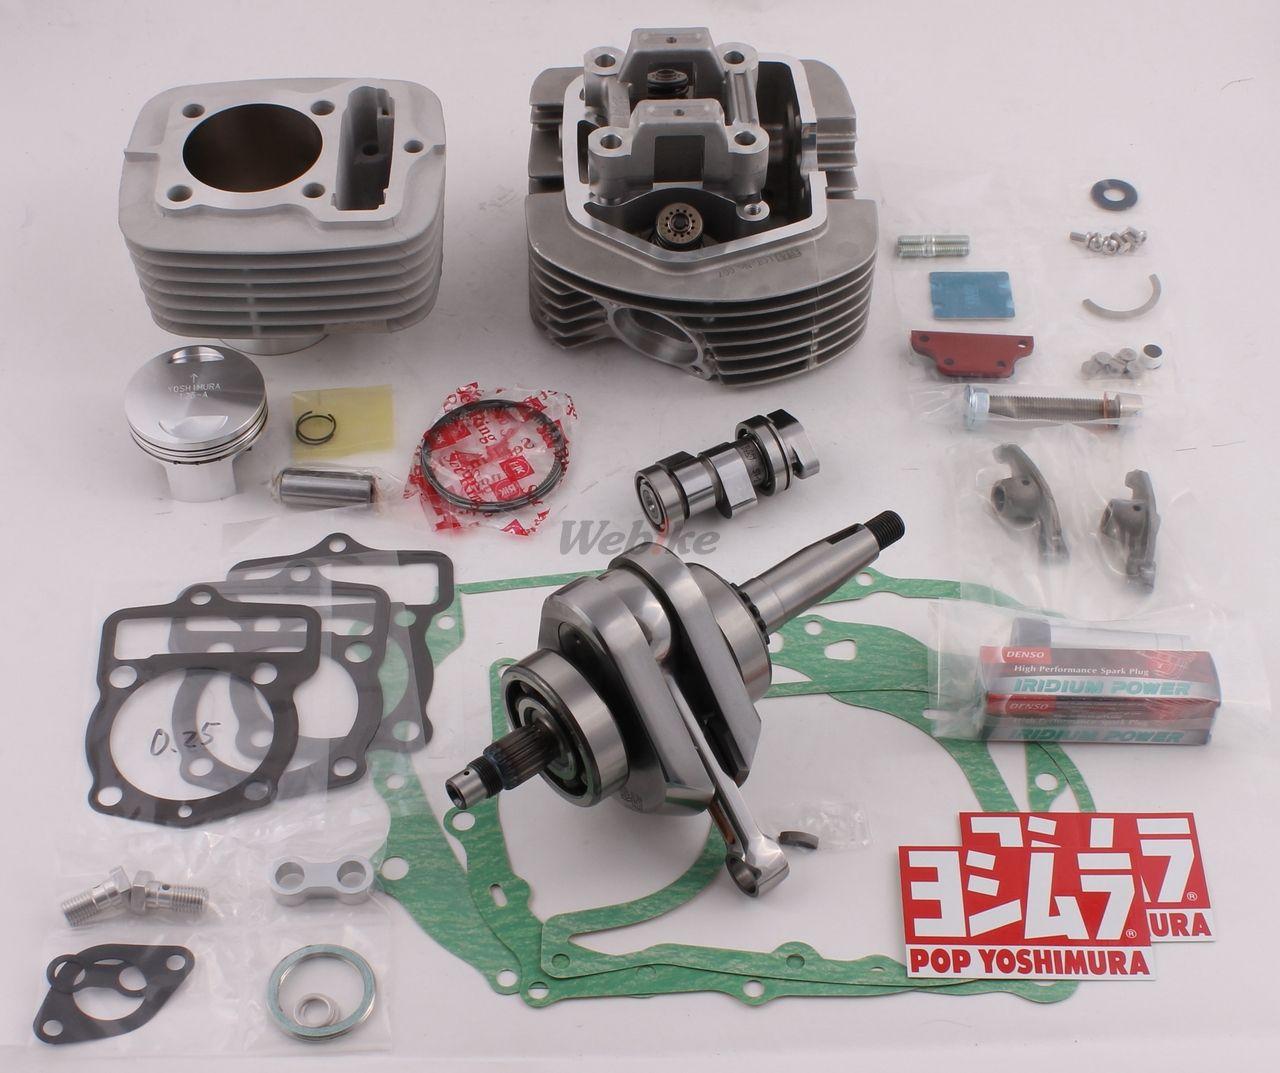 【YOSHIMURA】YOSHIMURA Head 125cc Type-R 改裝套件 - 「Webike-摩托百貨」